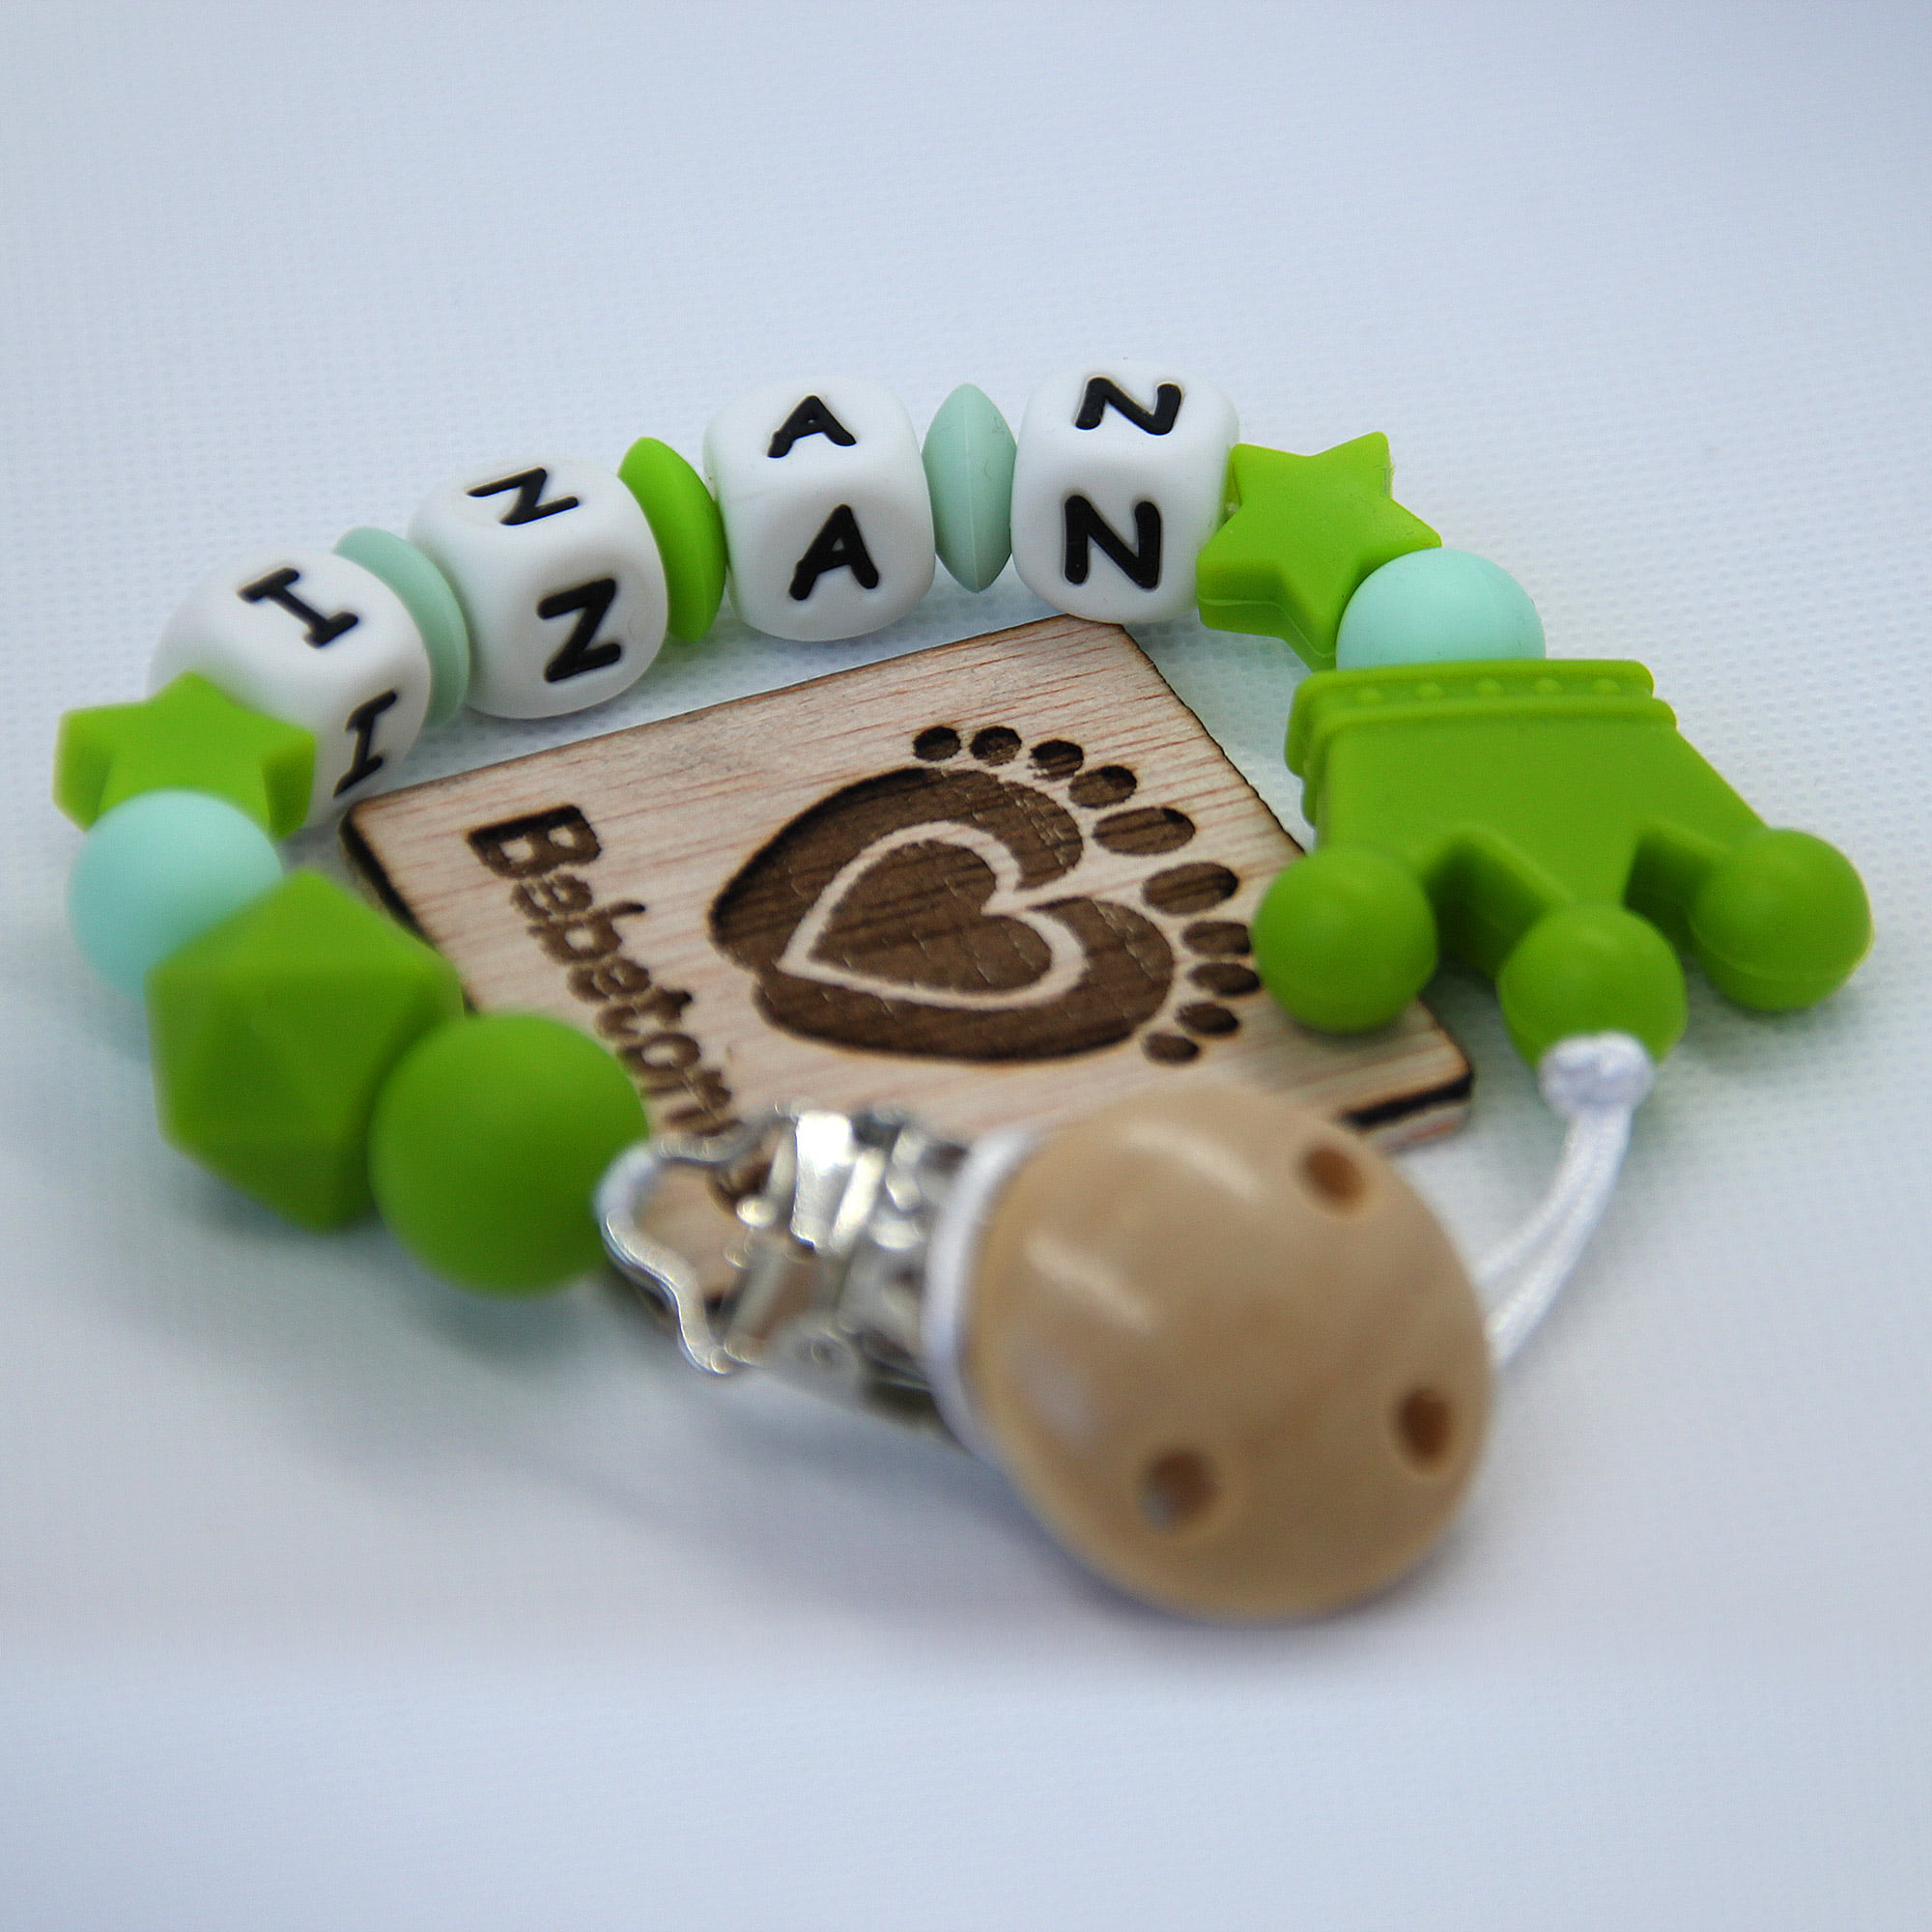 Chupetero personalizado Cártamo con logo